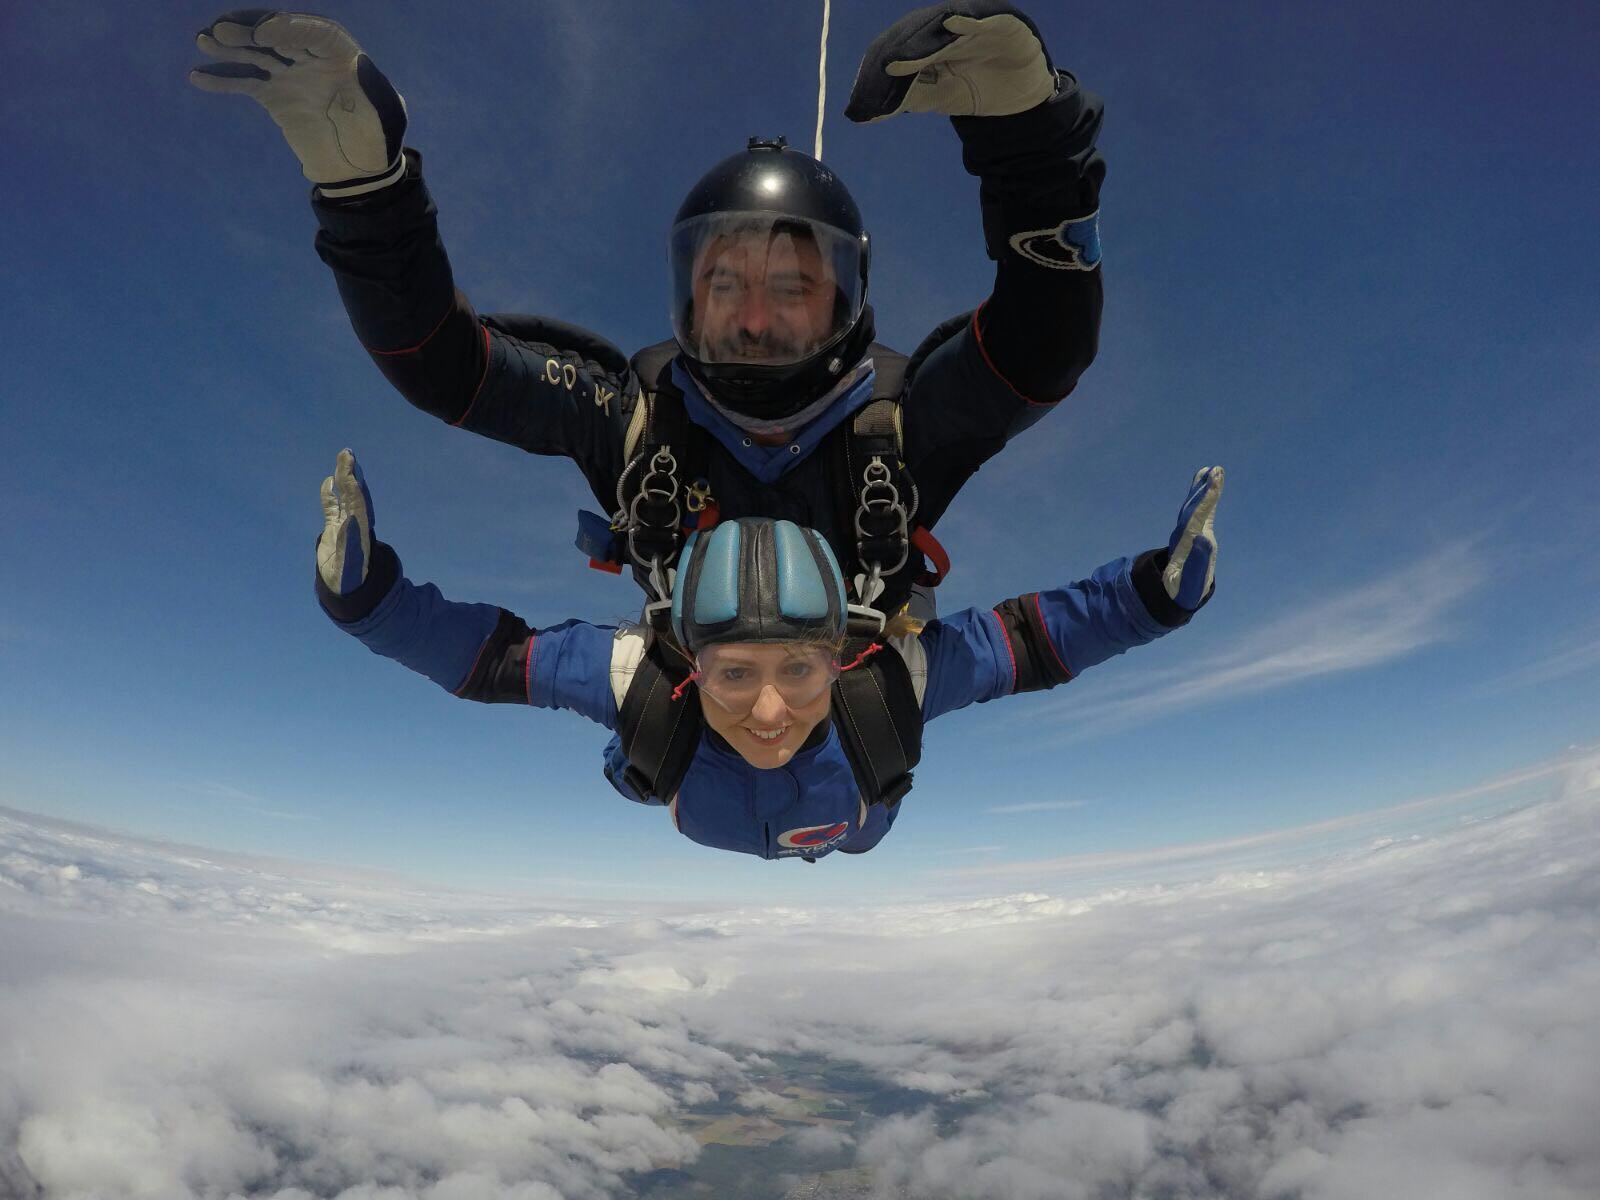 rory embling skydive